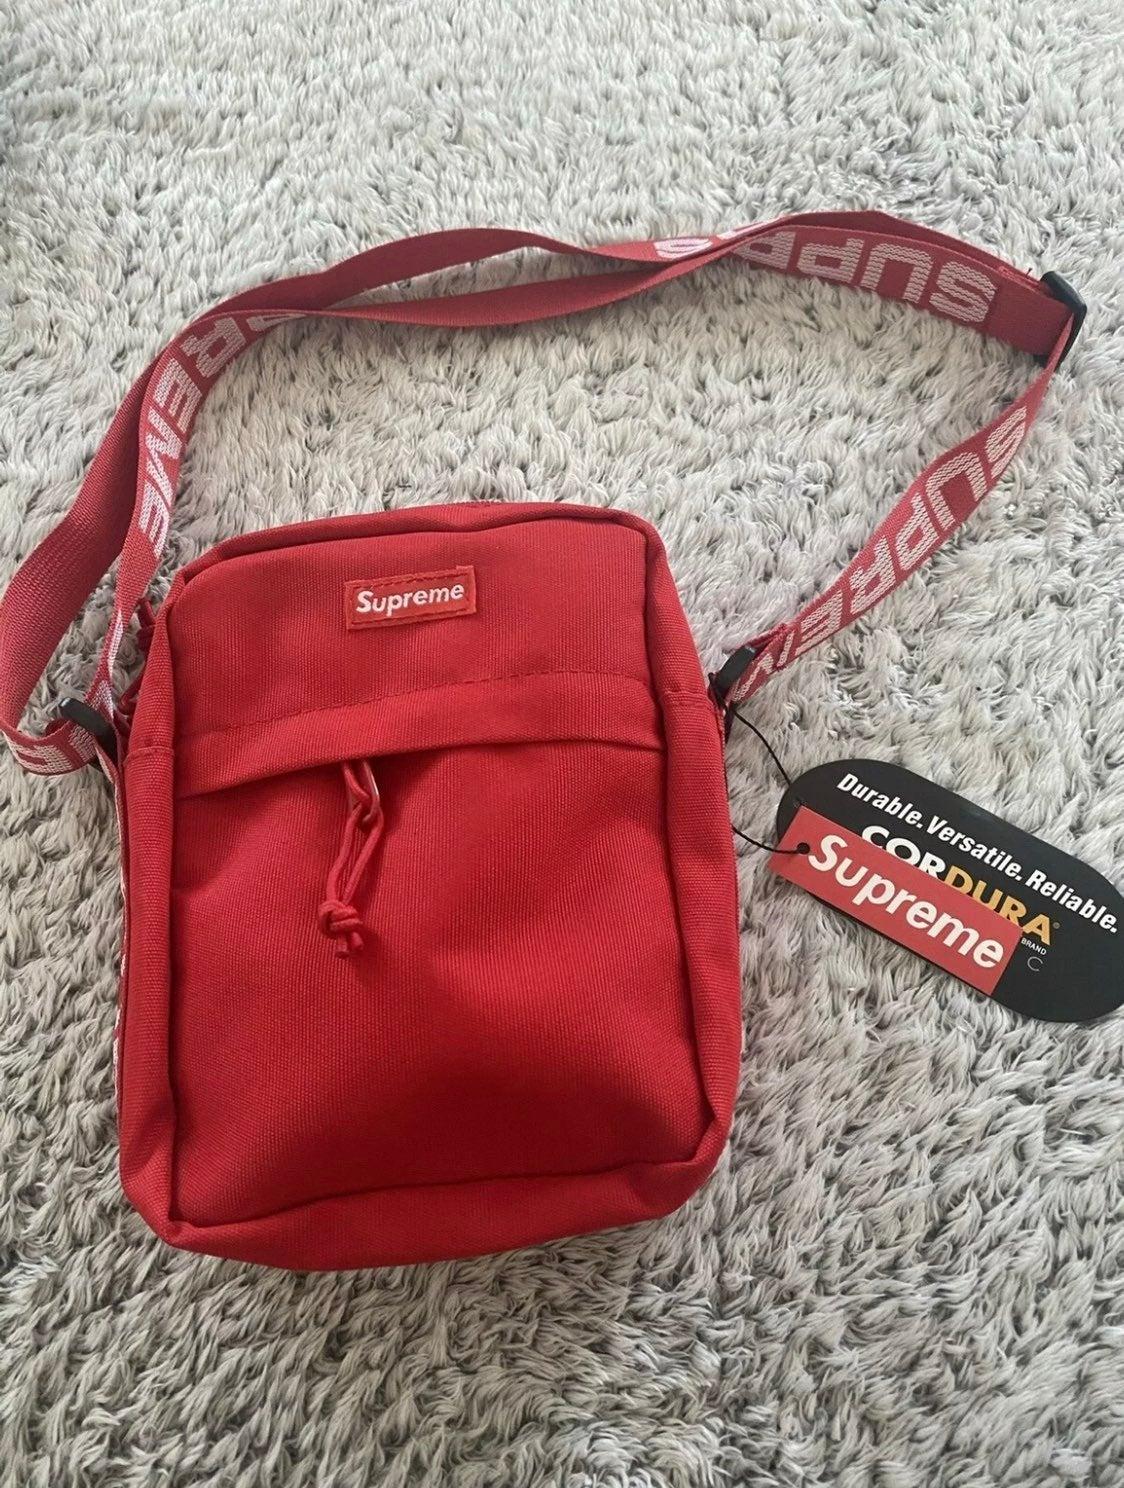 Supreme SS19 Waist Bag Authentic BOX LOGO SHOULDER BACKPACK DUFFLE MESSENGER TNF